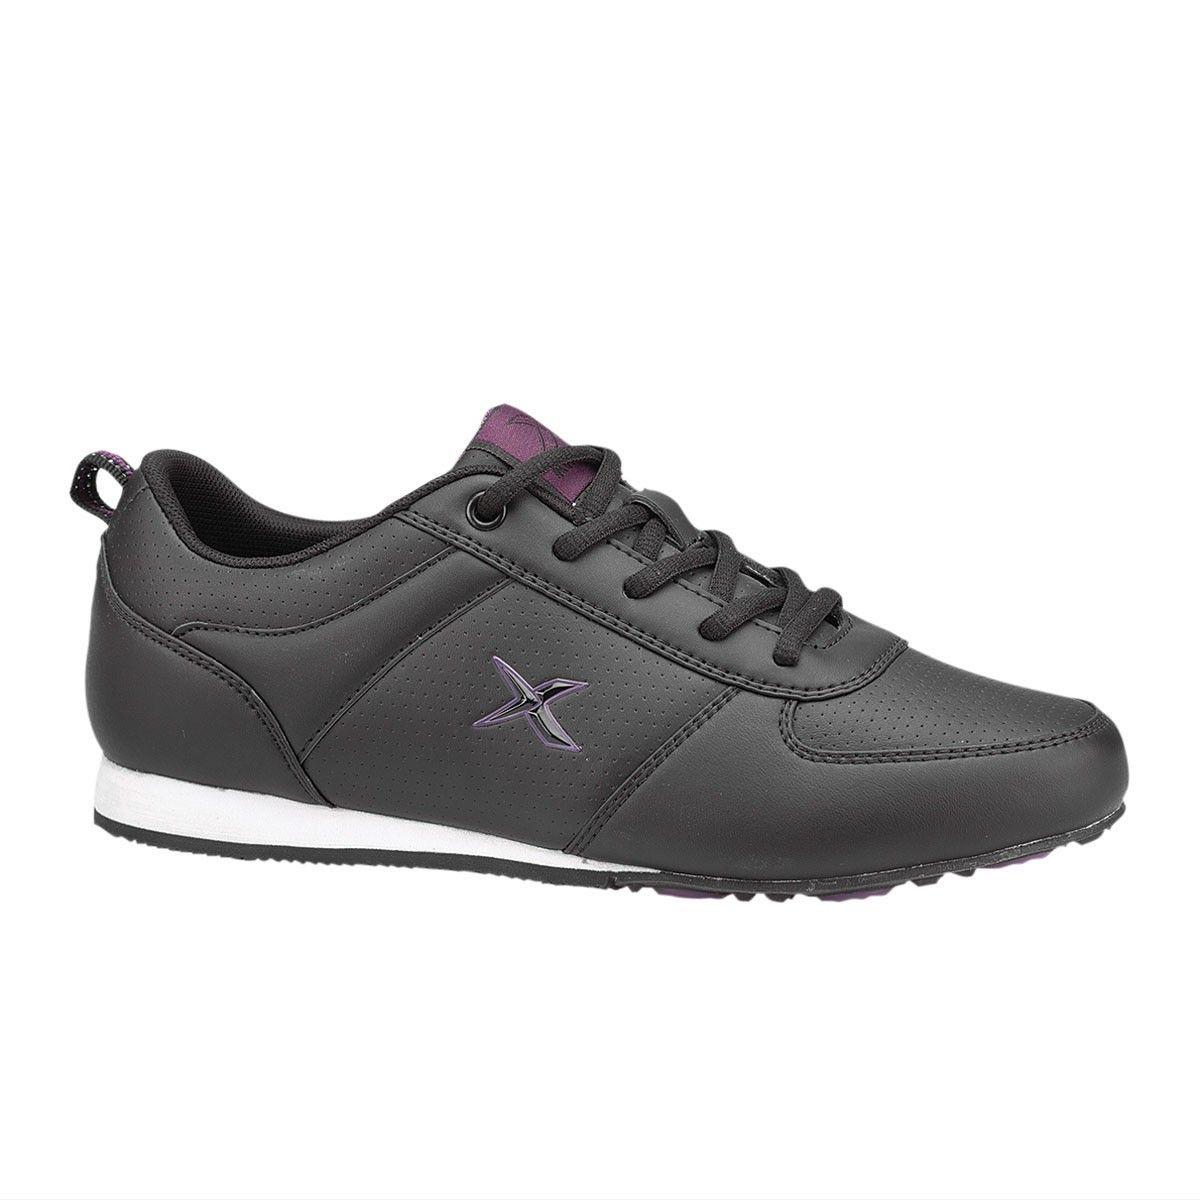 Kinetix Sonia Siyah Kadin Sneaker Sneaker Cizmeler Siyah